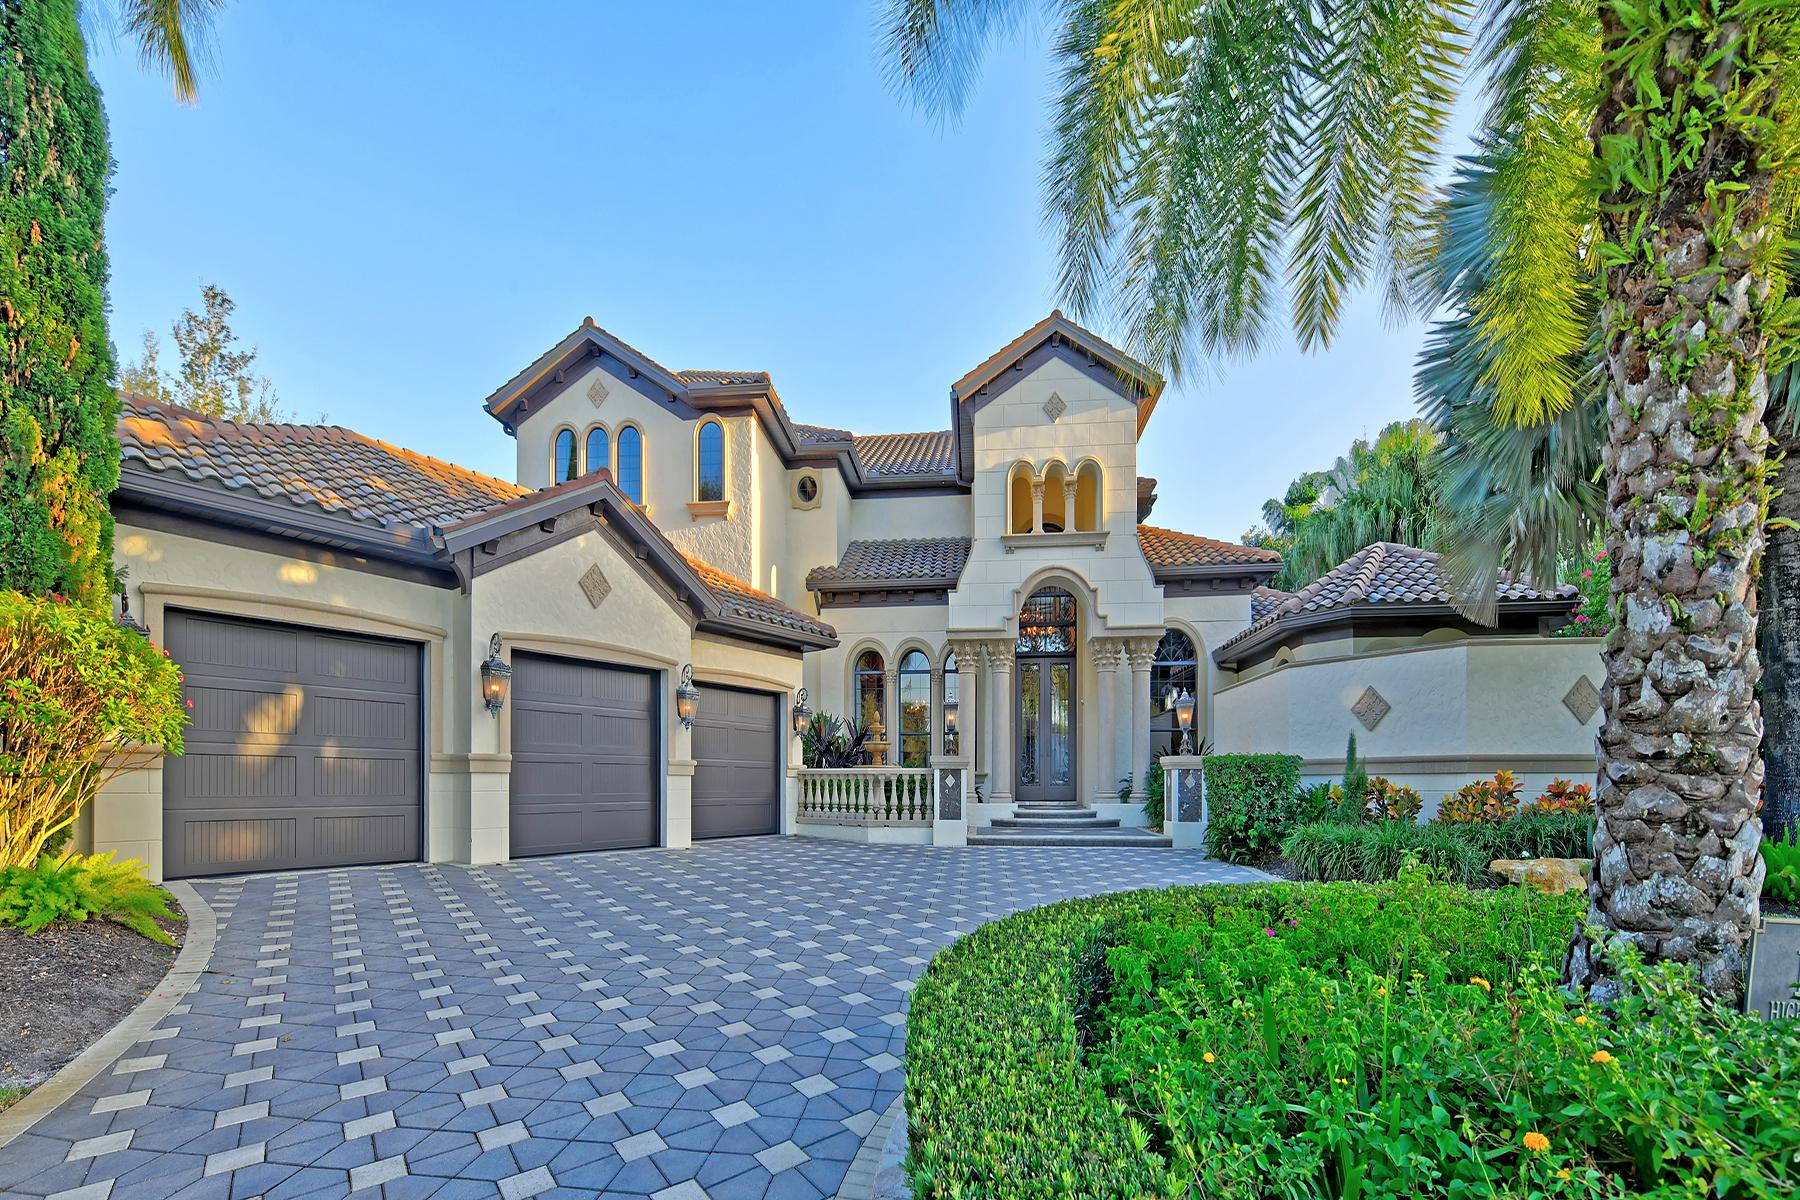 Single Family Homes için Satış at LAKEWOOD RANCH COUNTRY CLUB 12539 Highfield Cir, Lakewood Ranch, Florida 34202 Amerika Birleşik Devletleri